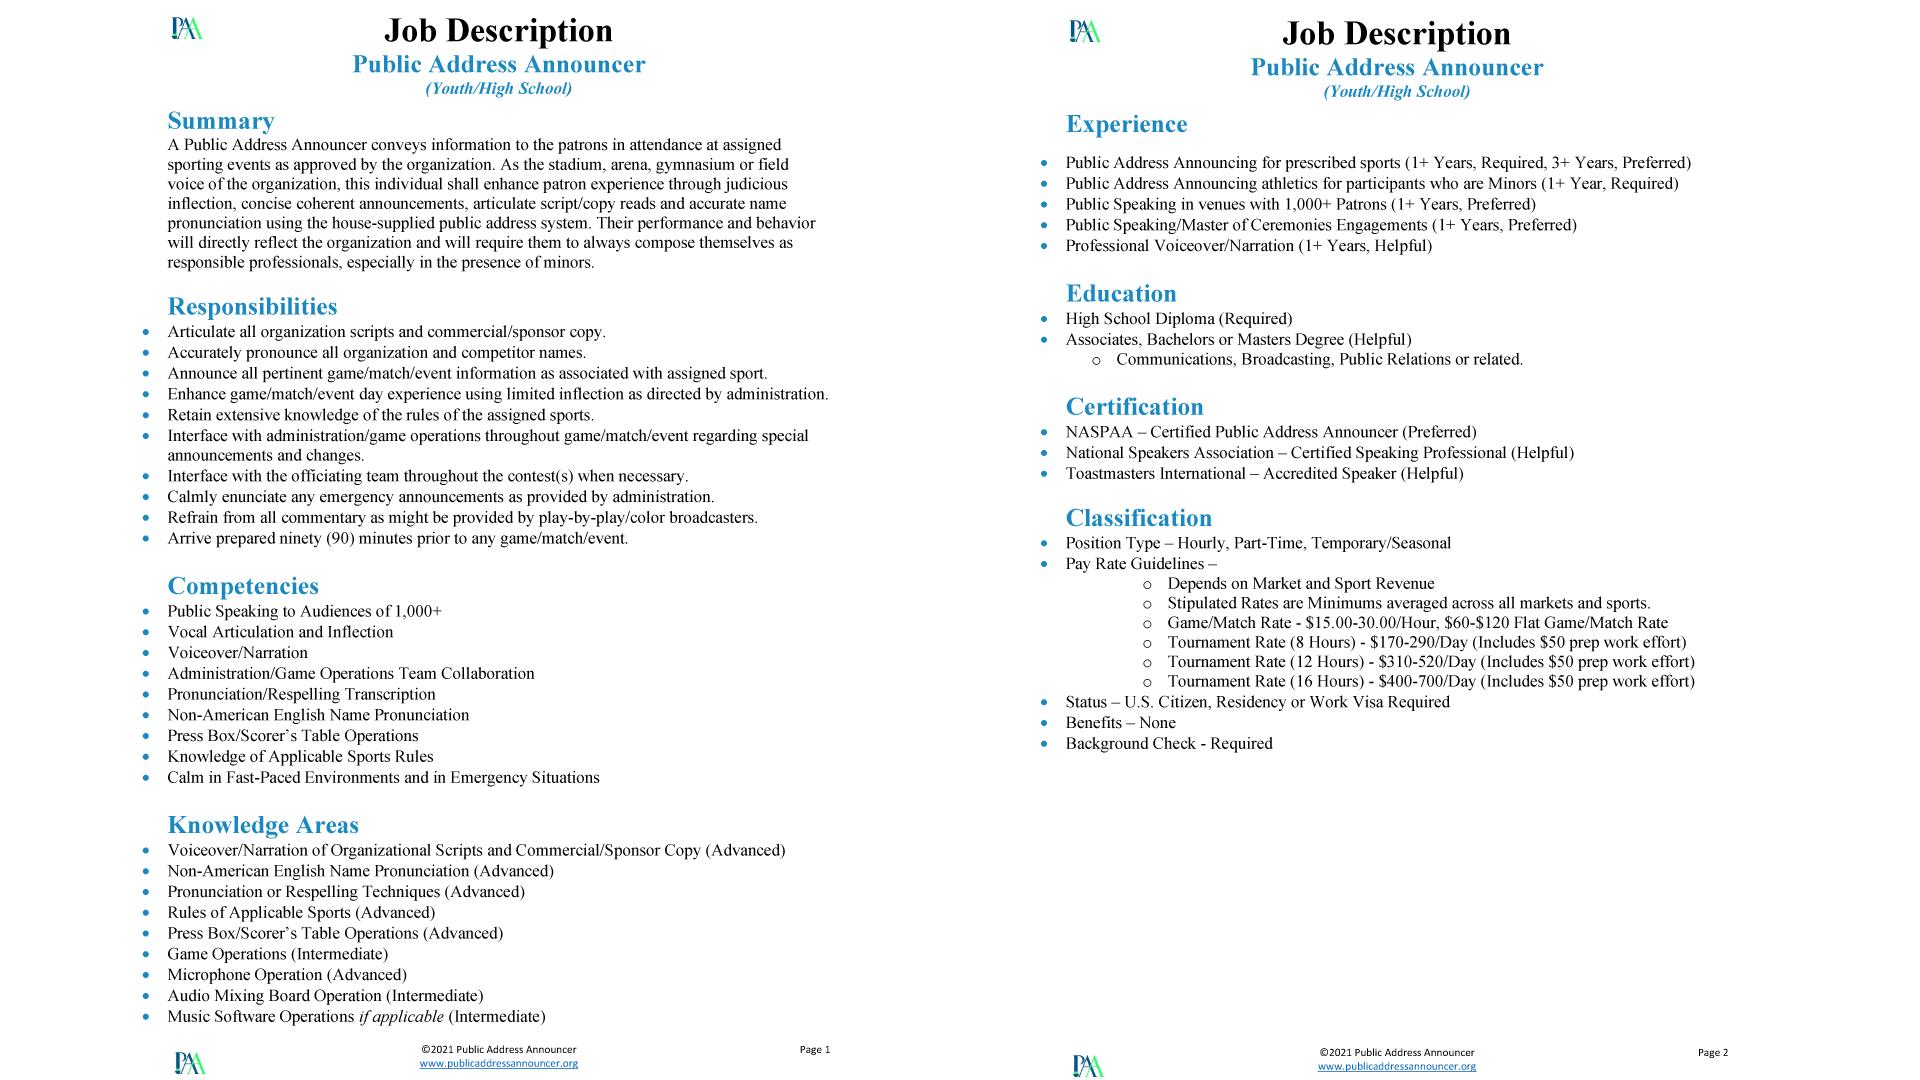 Job Description - Public Address Announcer - High School and Youth